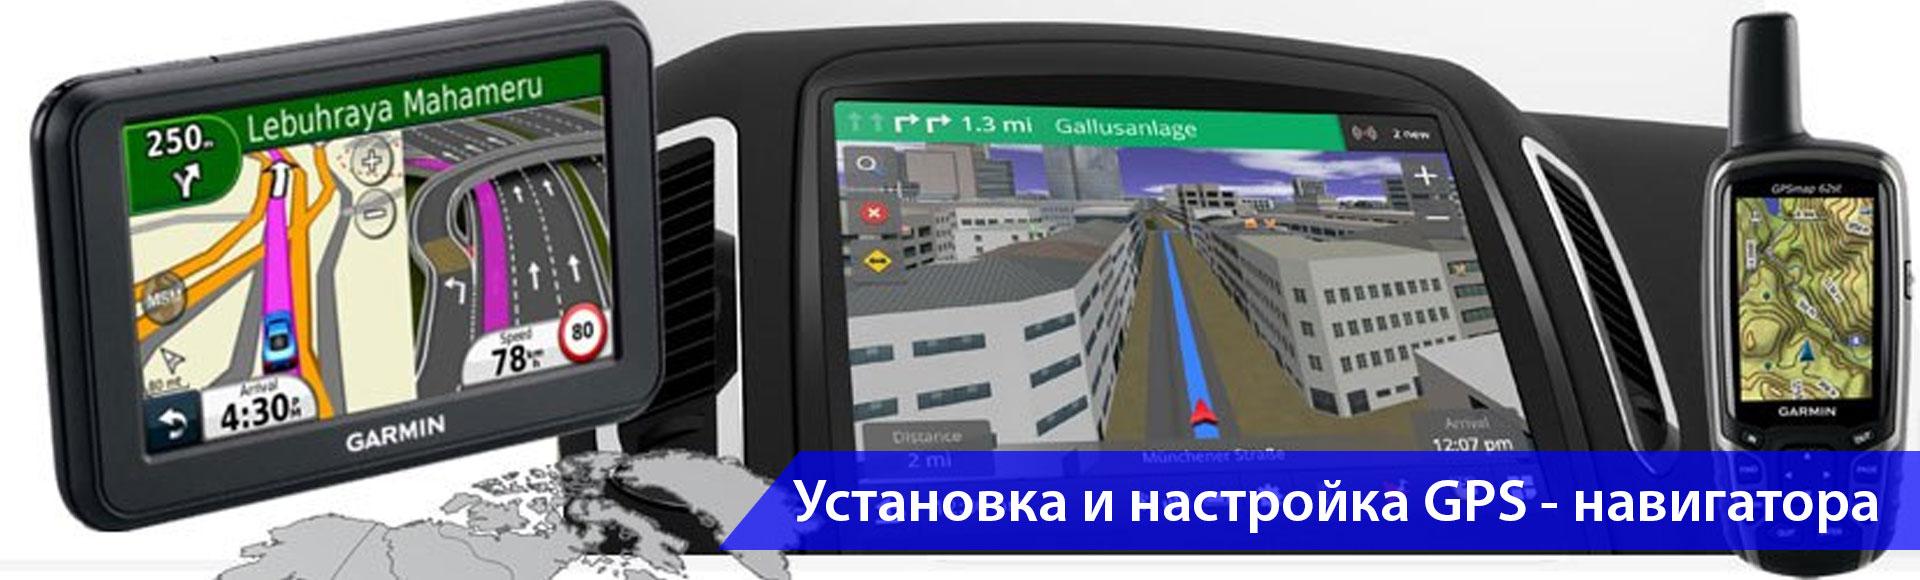 установка навигатора